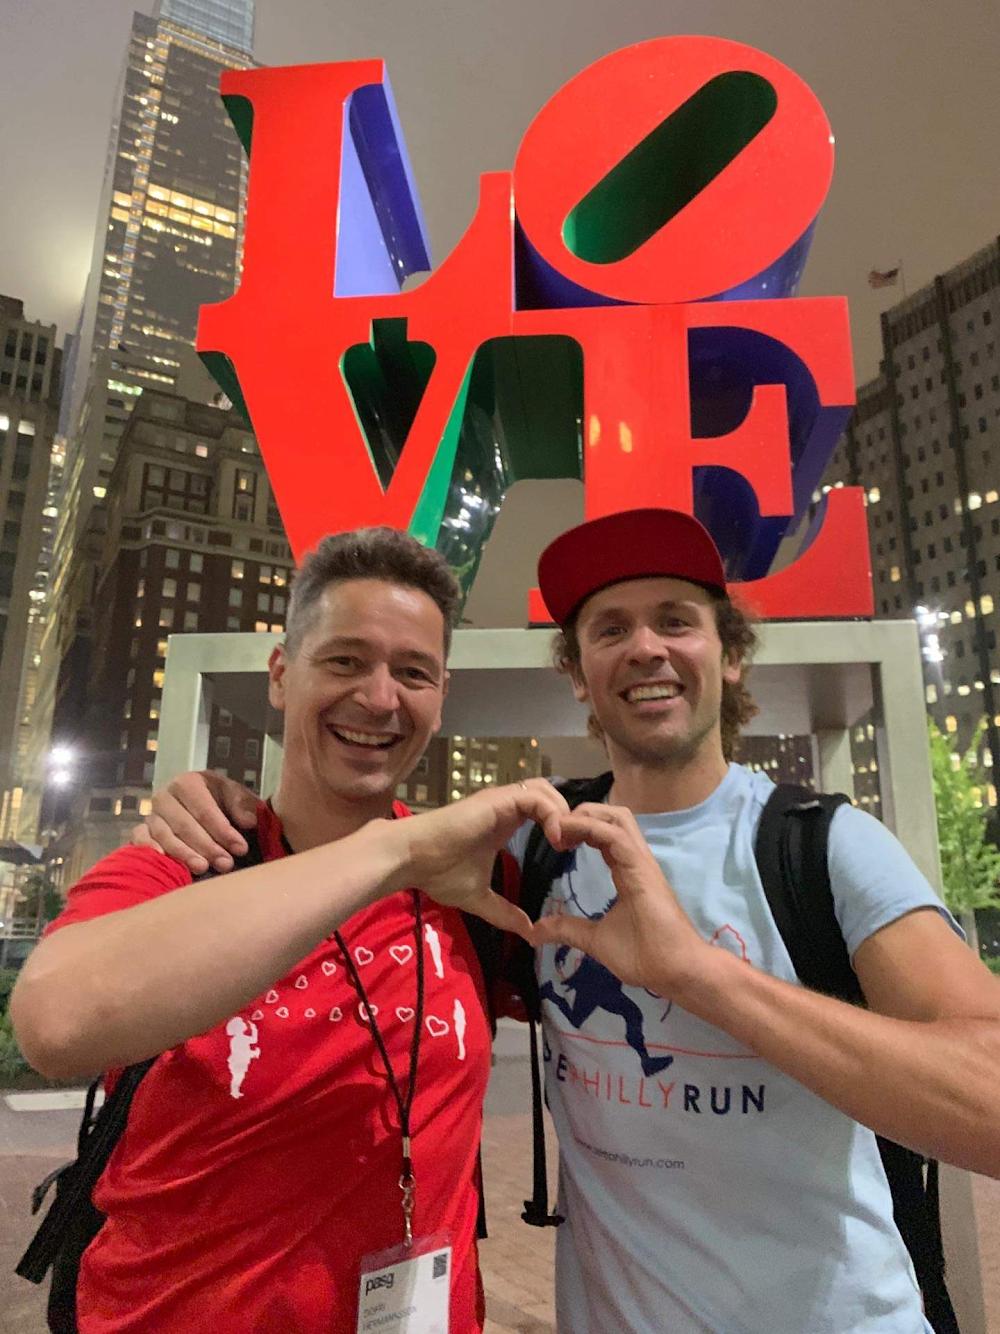 The Philly Heart Run